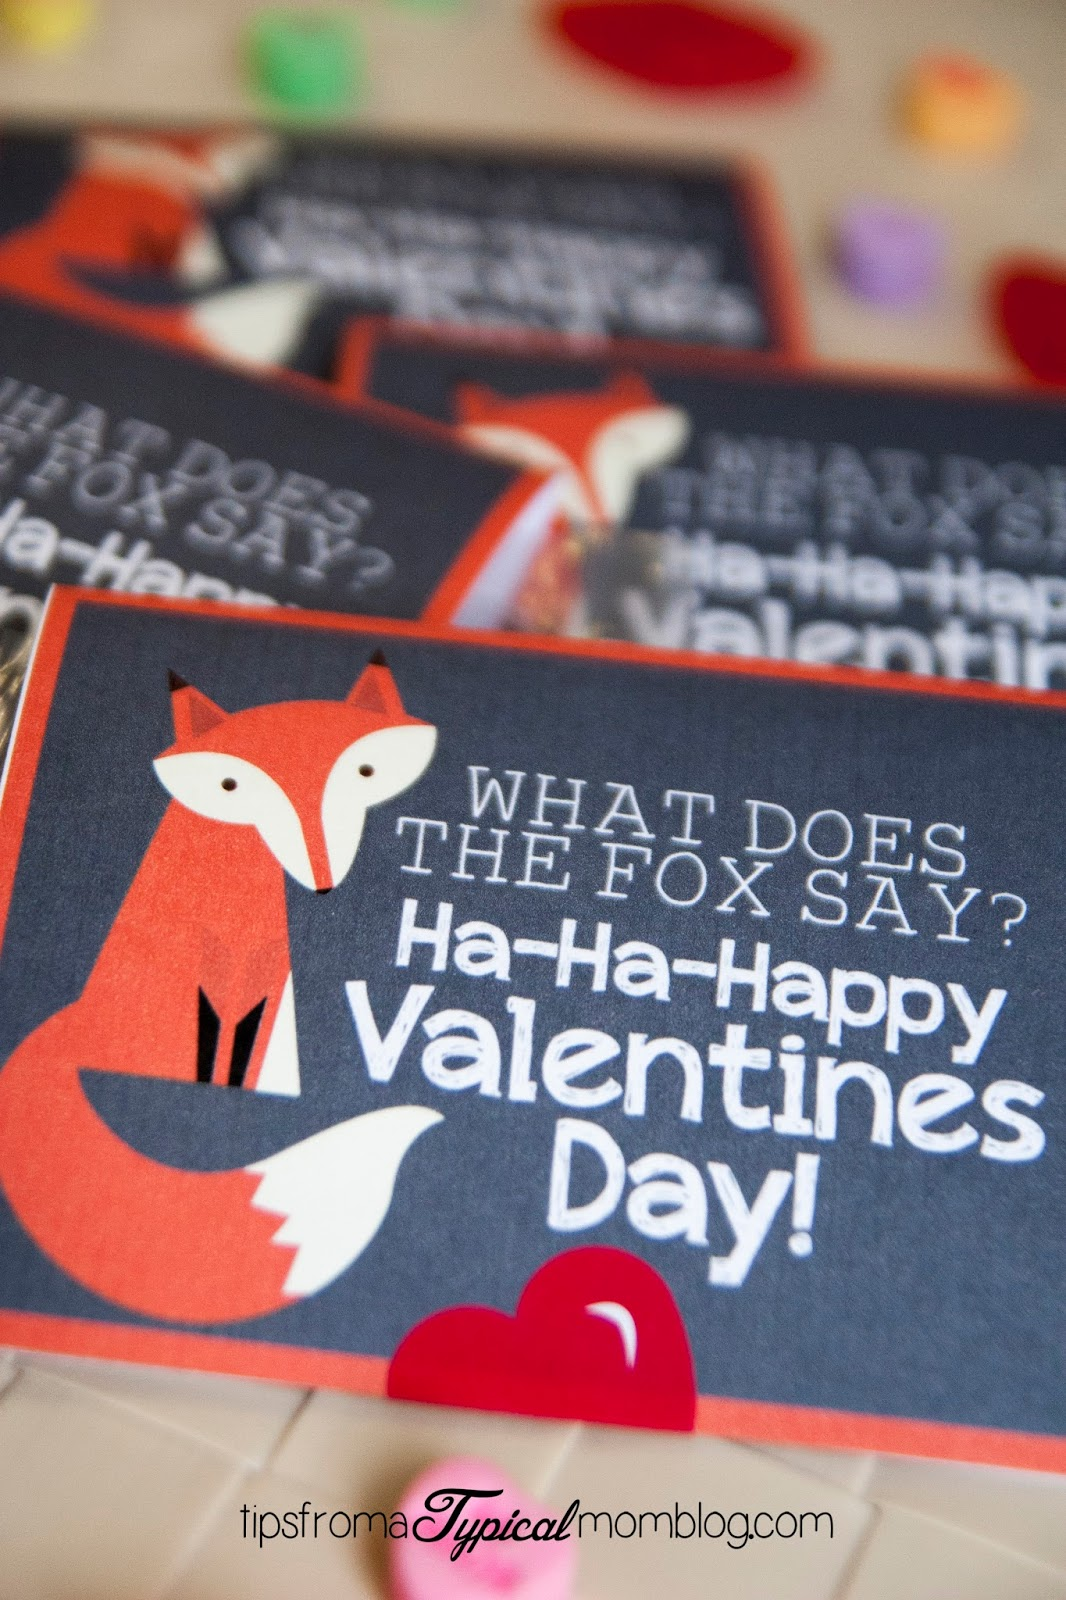 Happy Valentines Day Everyone!